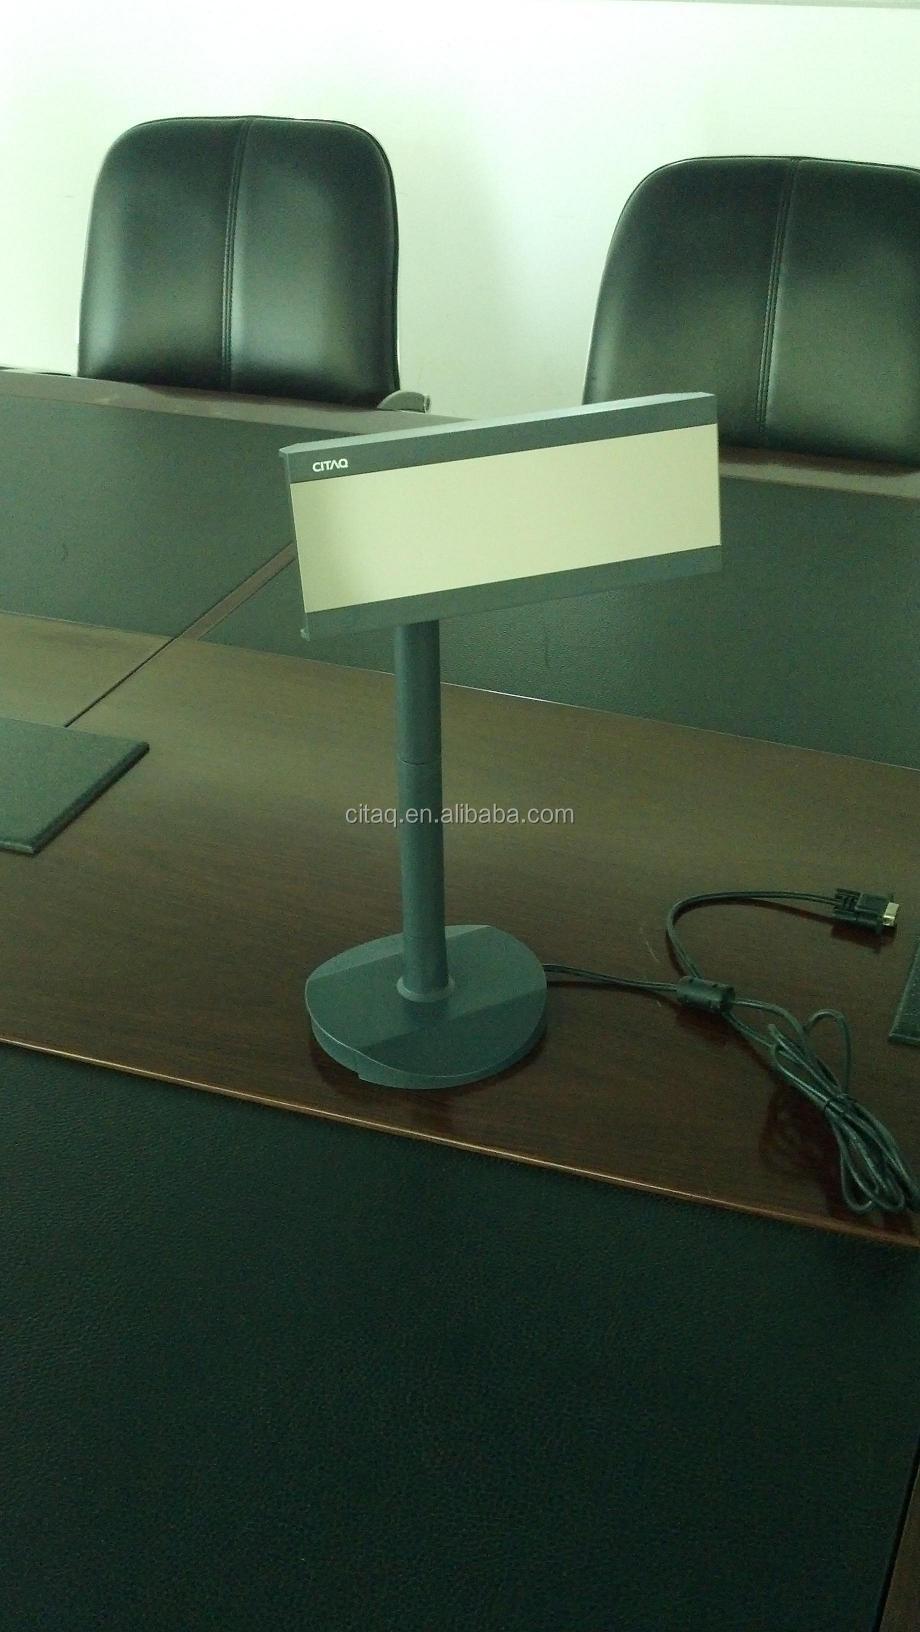 photo - CITAQ VFD POS Customer Display.jpg